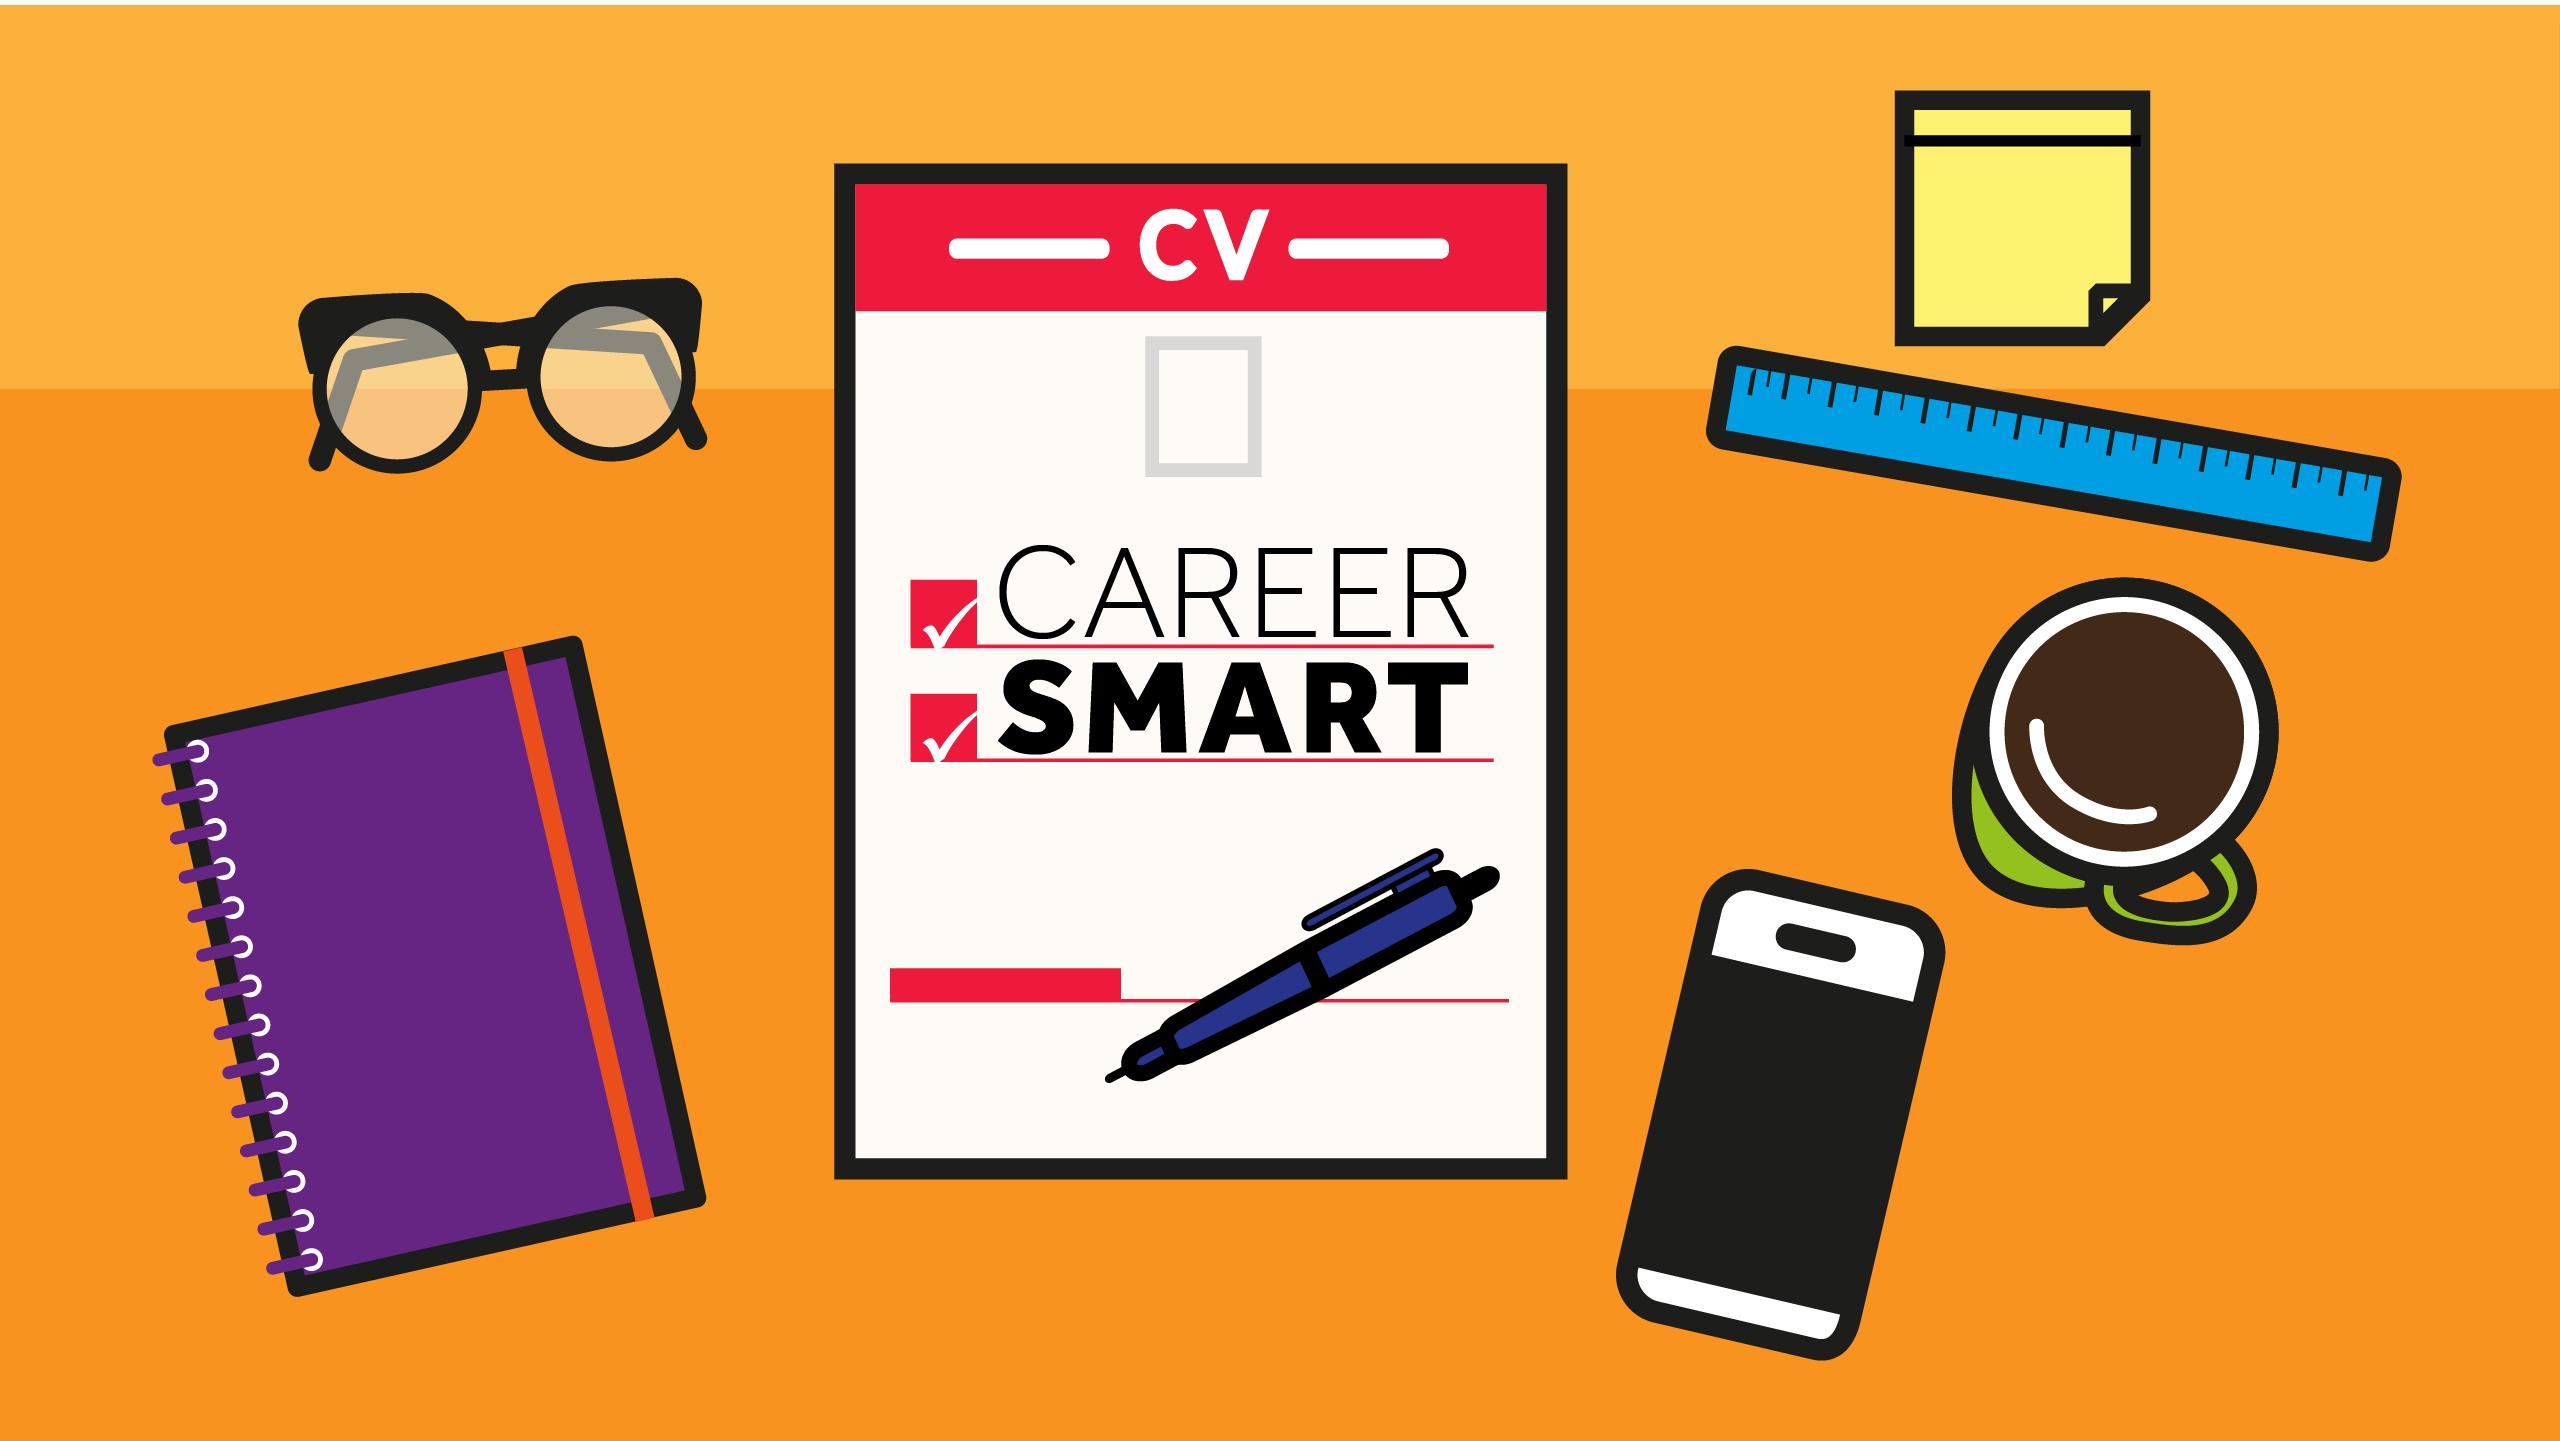 Career Smart